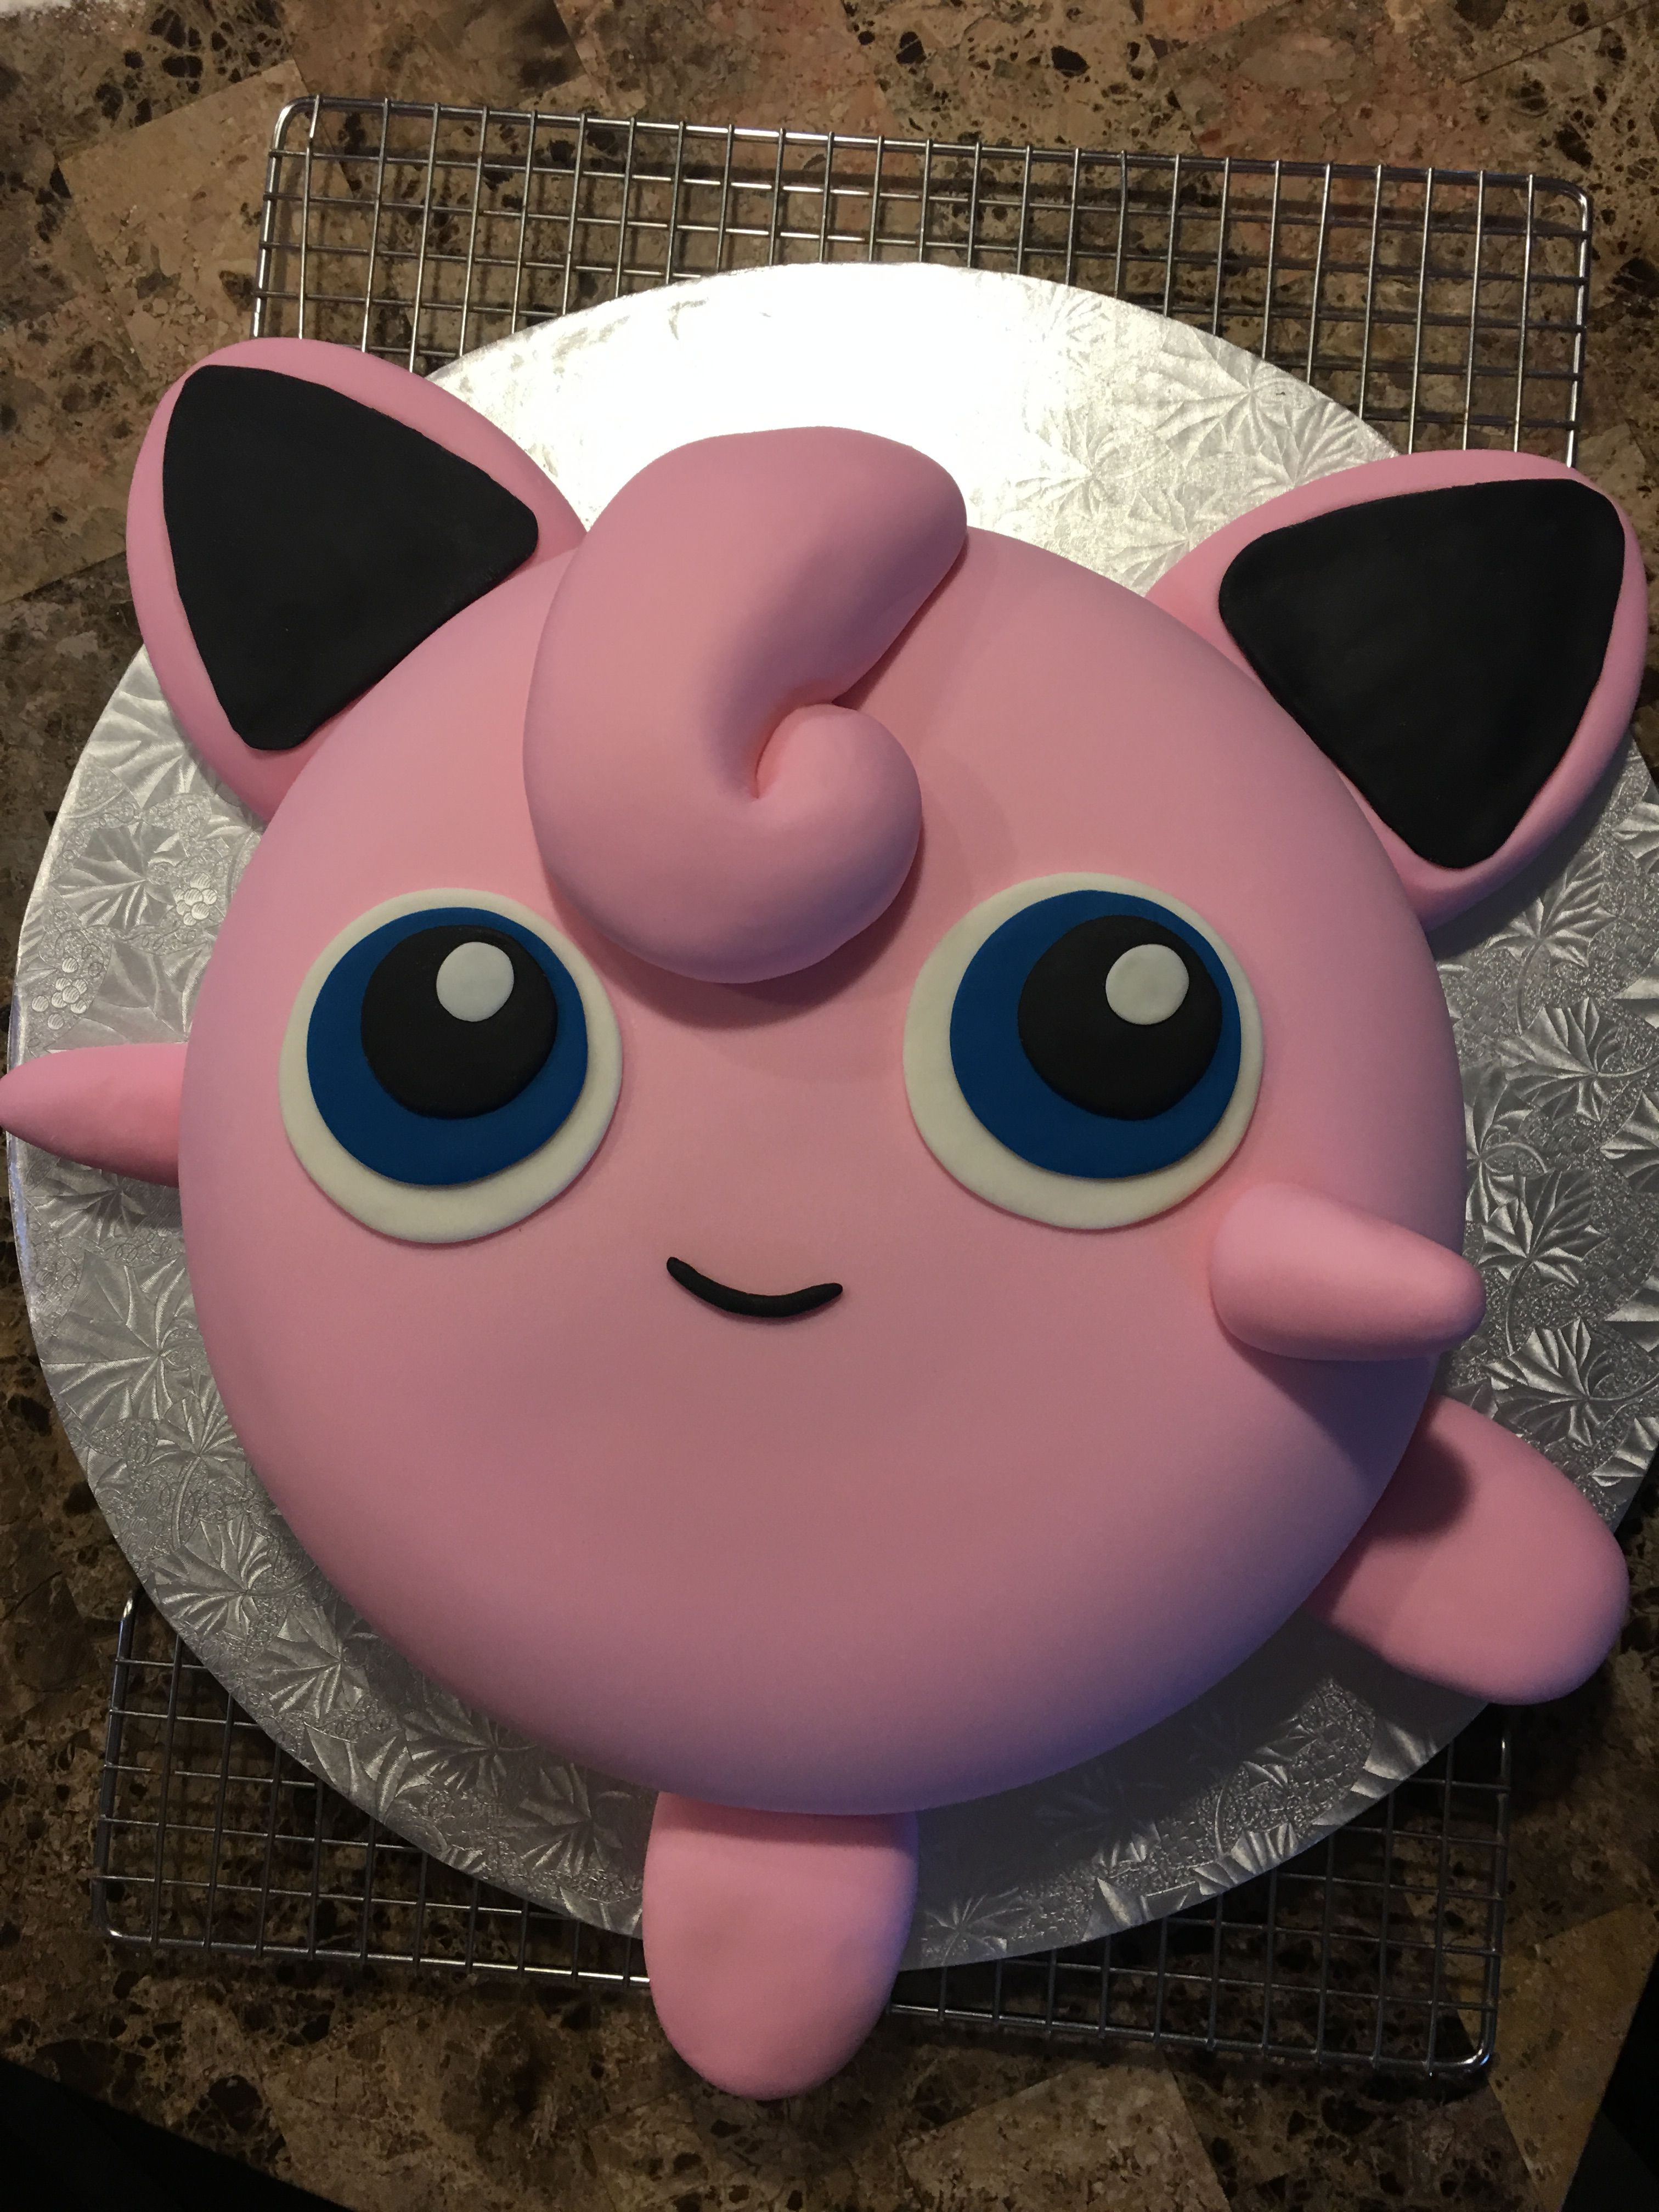 Jigglypuff Pok 233 Mon Birthday Cake I Made For My Daughter S